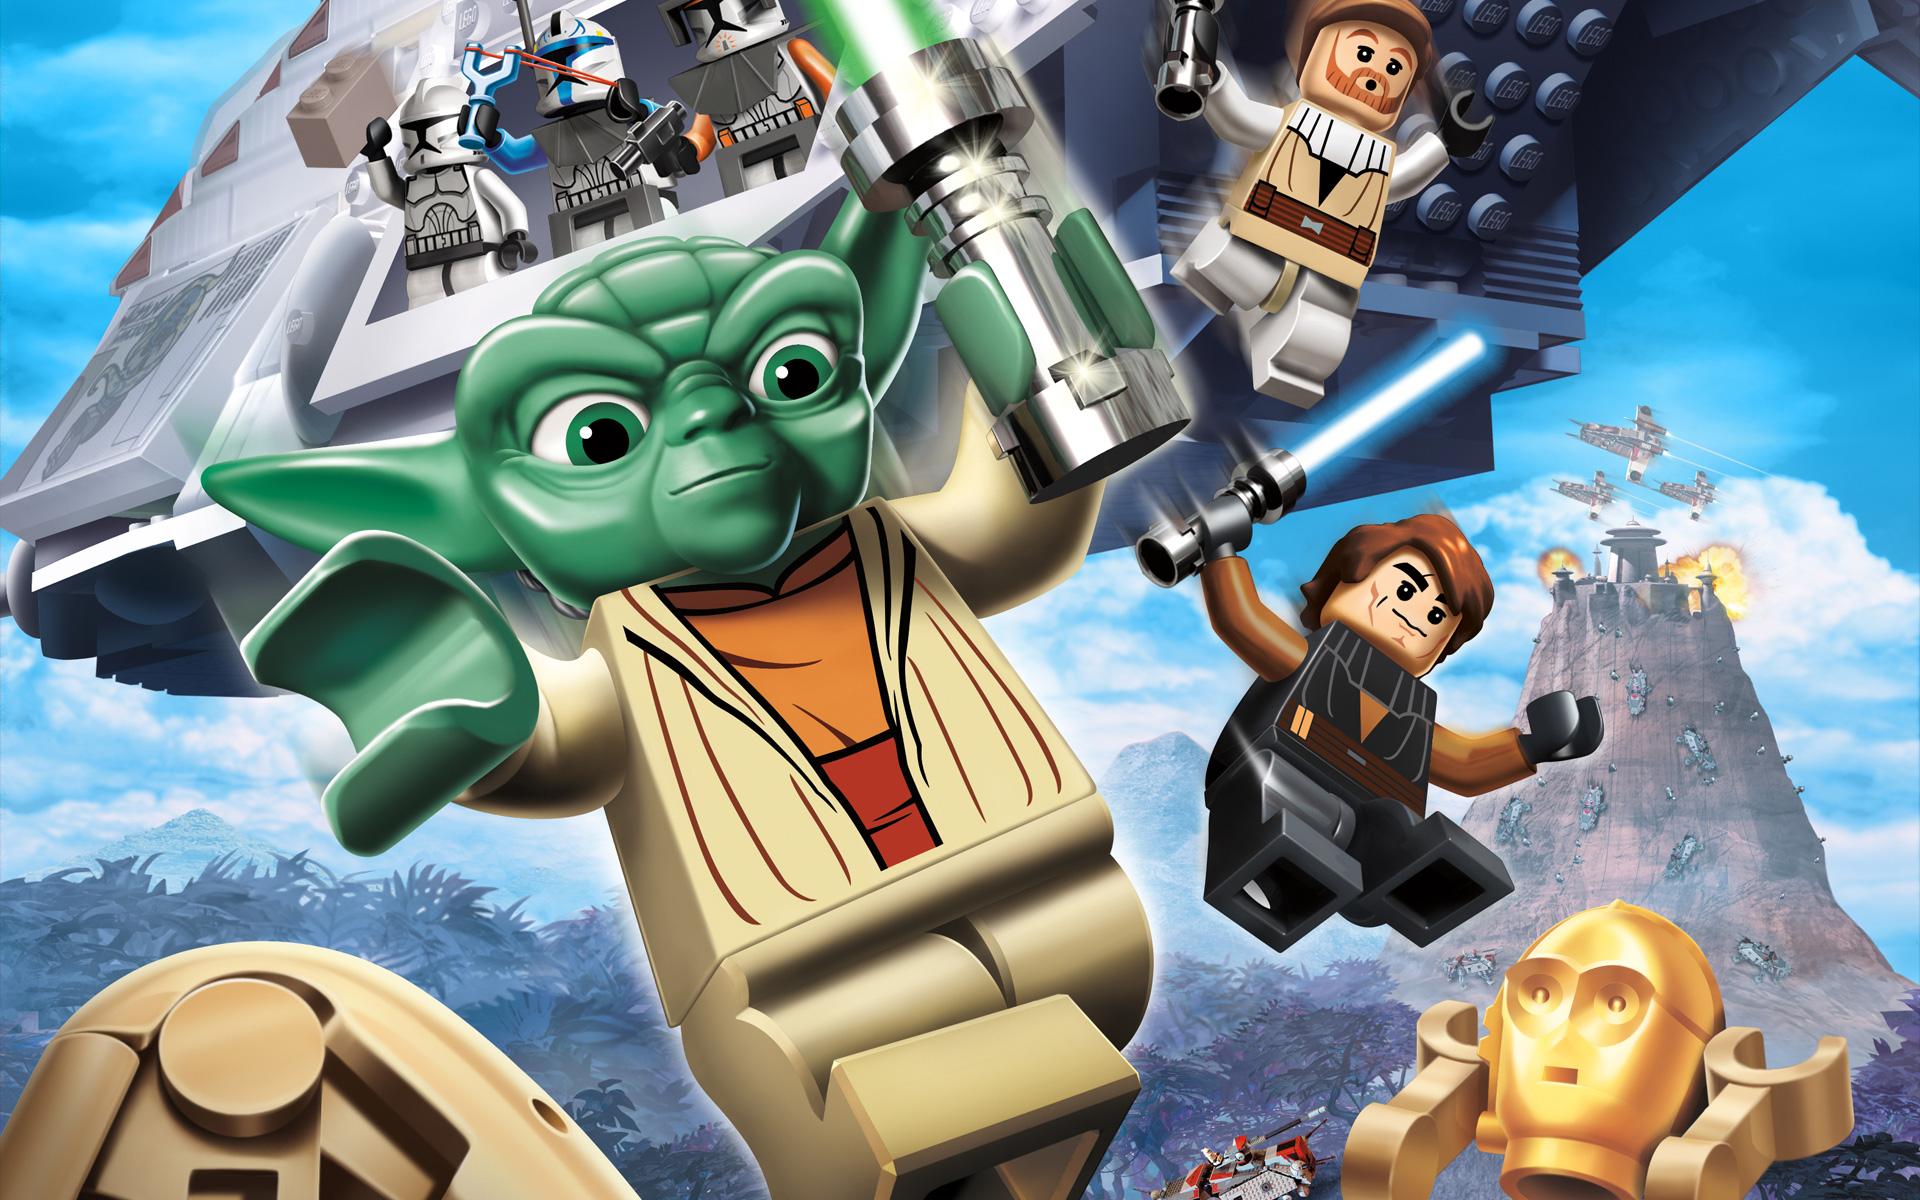 Free Lego Star Wars III: The Clone Wars Wallpaper in 1920x1200